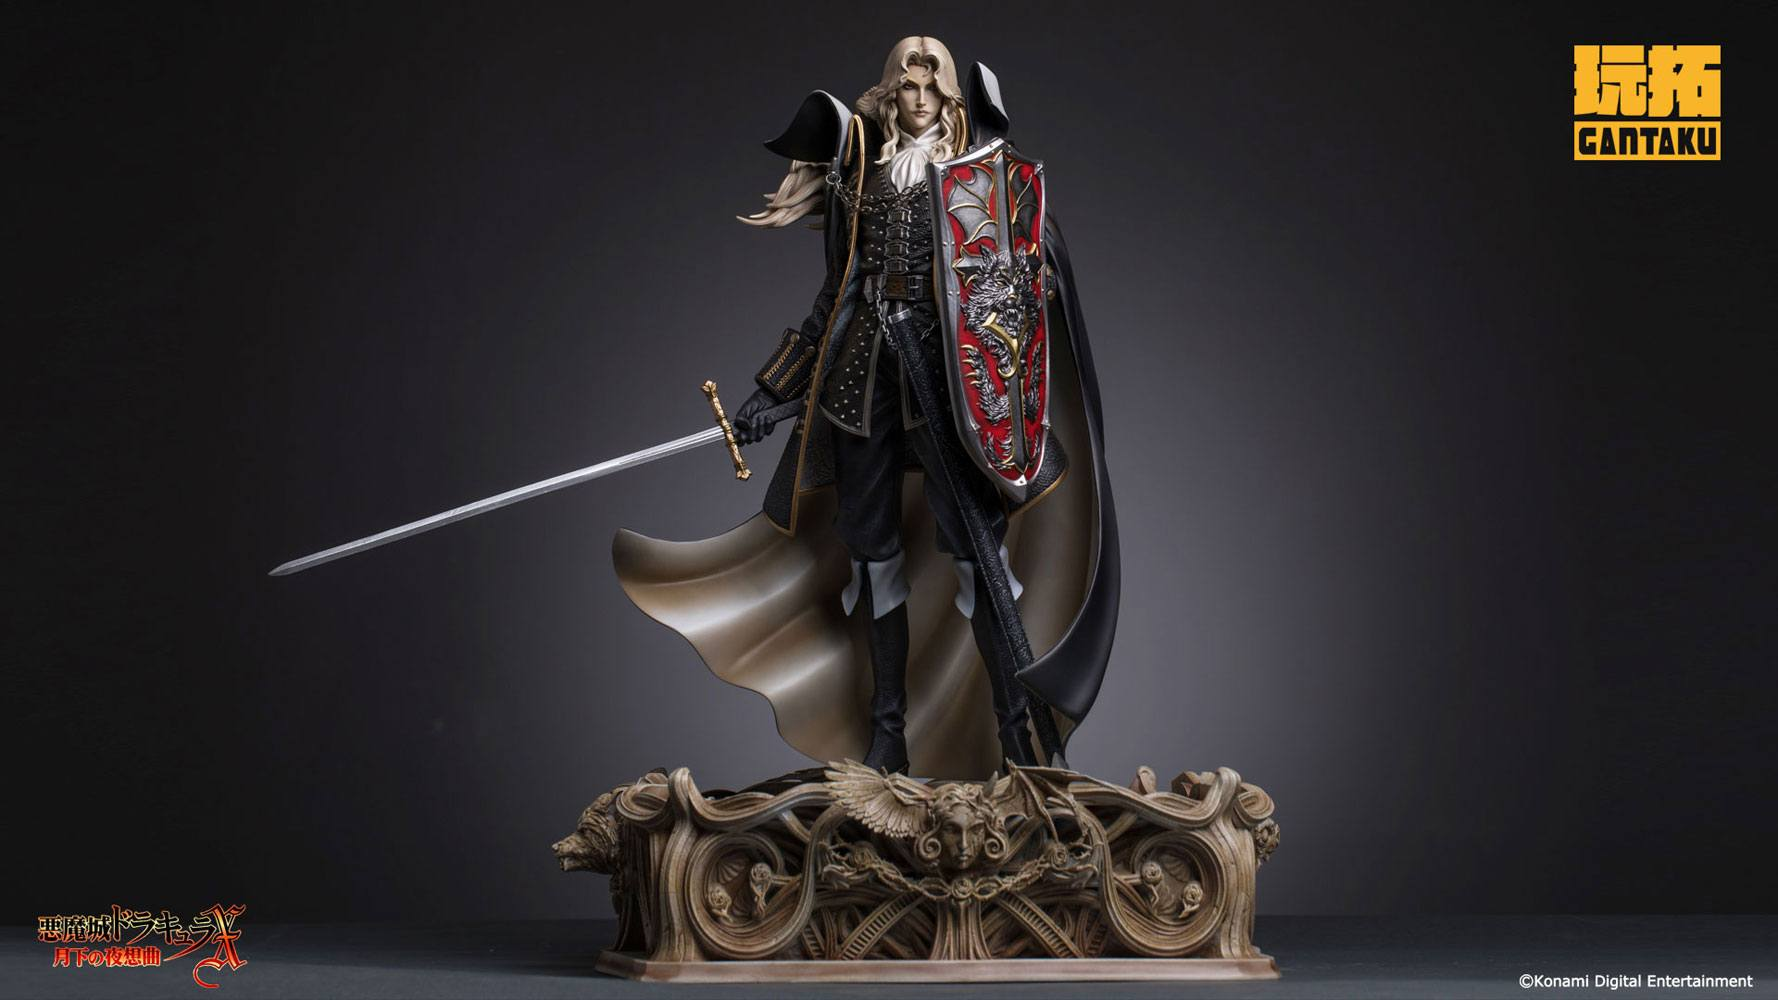 Alucard Castlevania Symphony of the Night 1/5 Statue by Gantaku